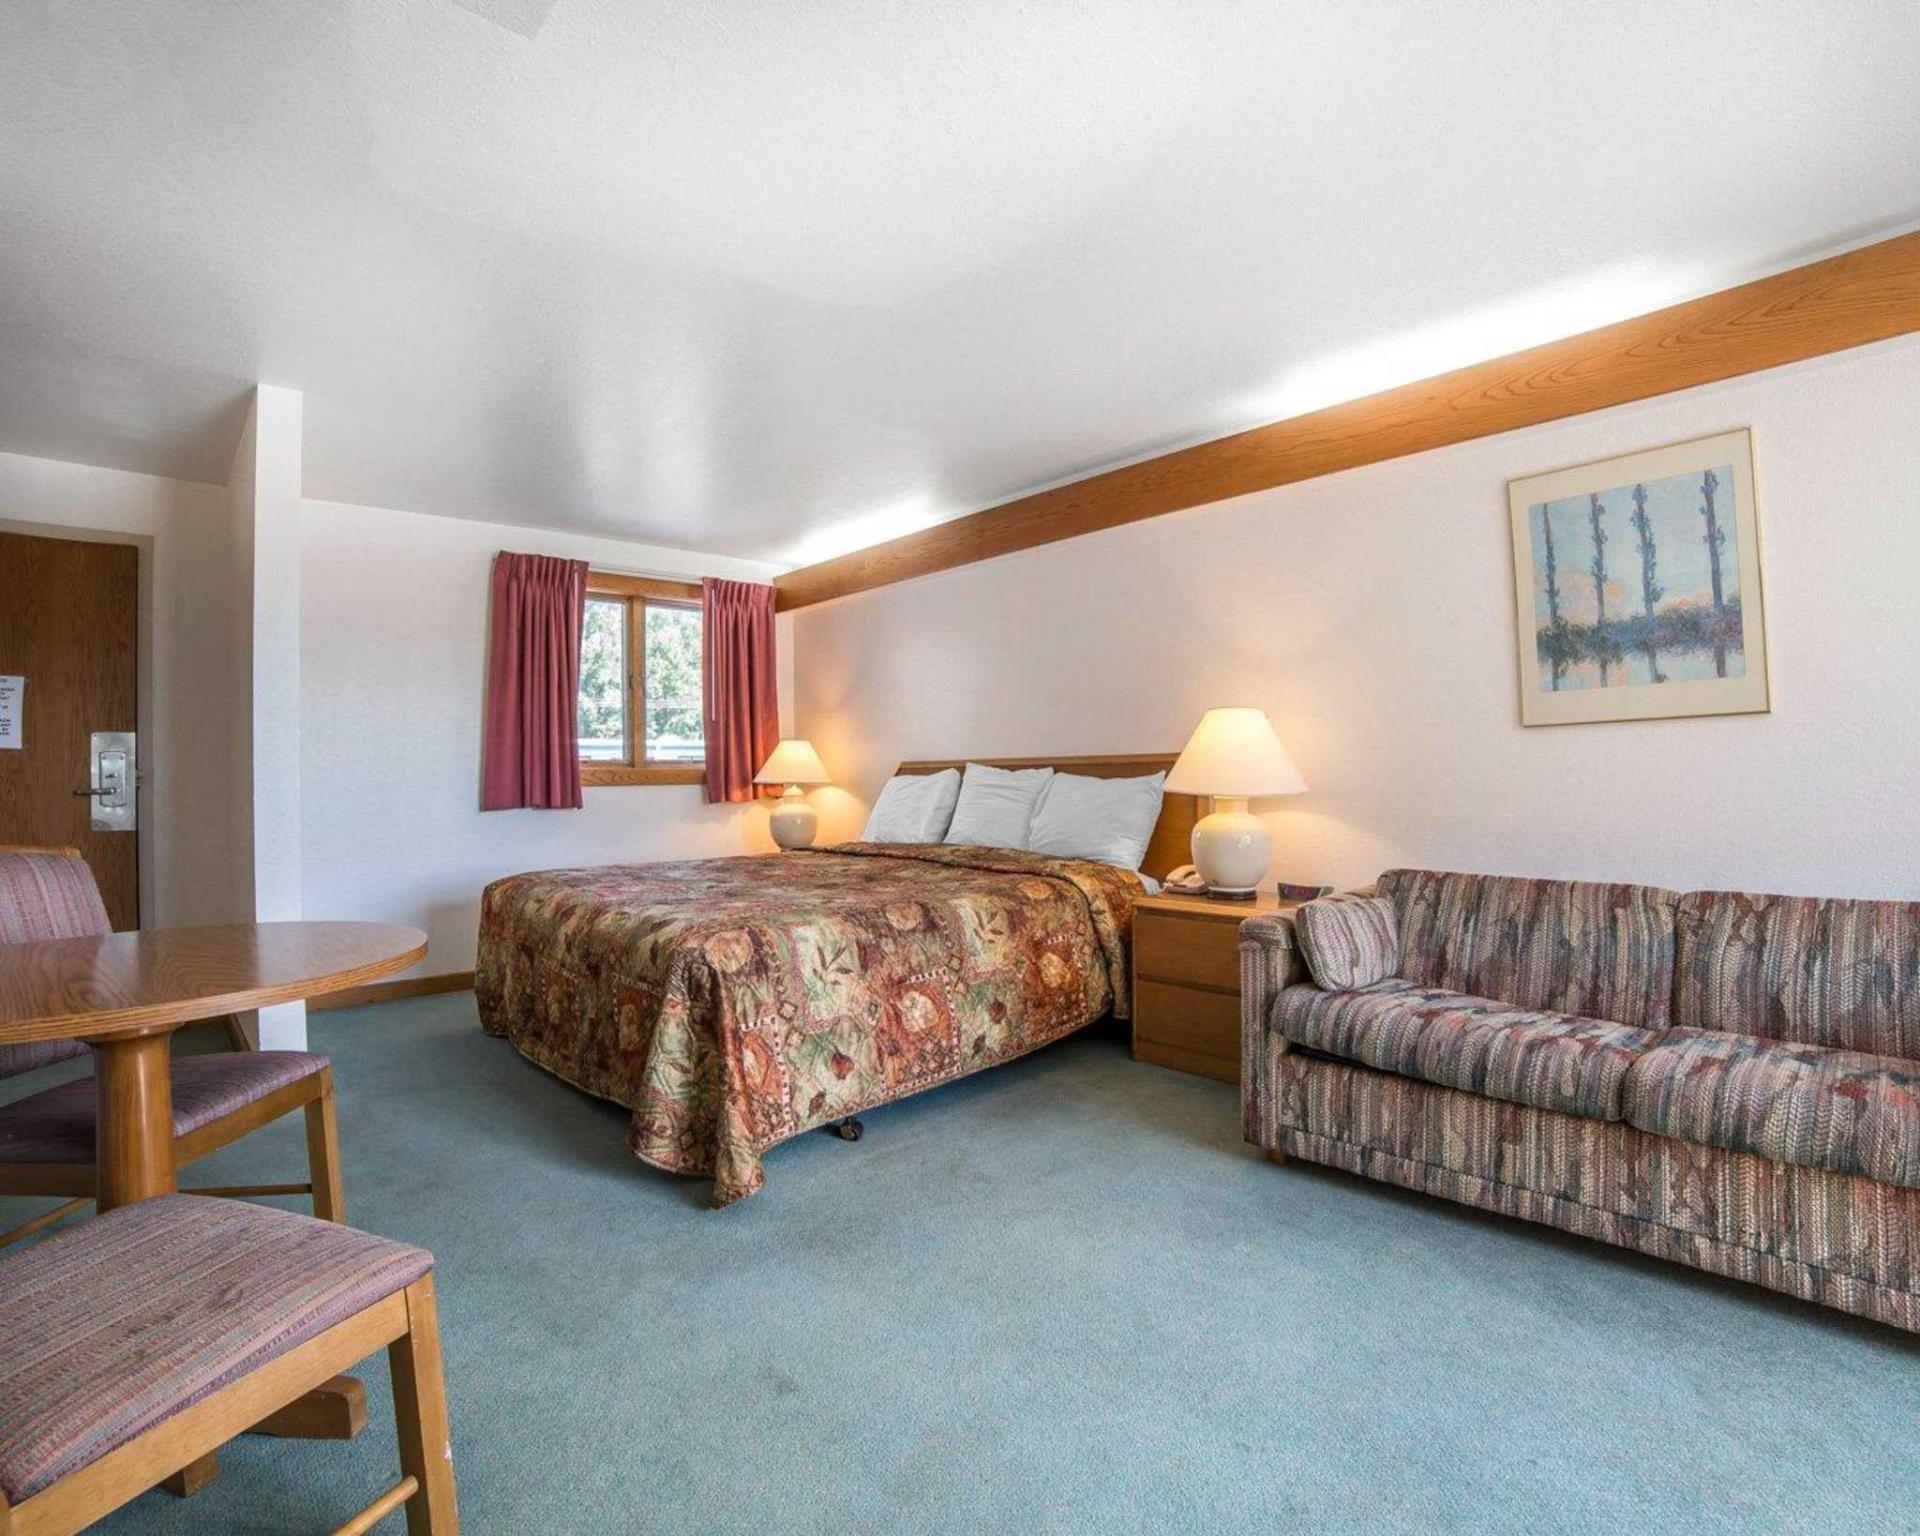 Rodeway Inn, Yellowstone